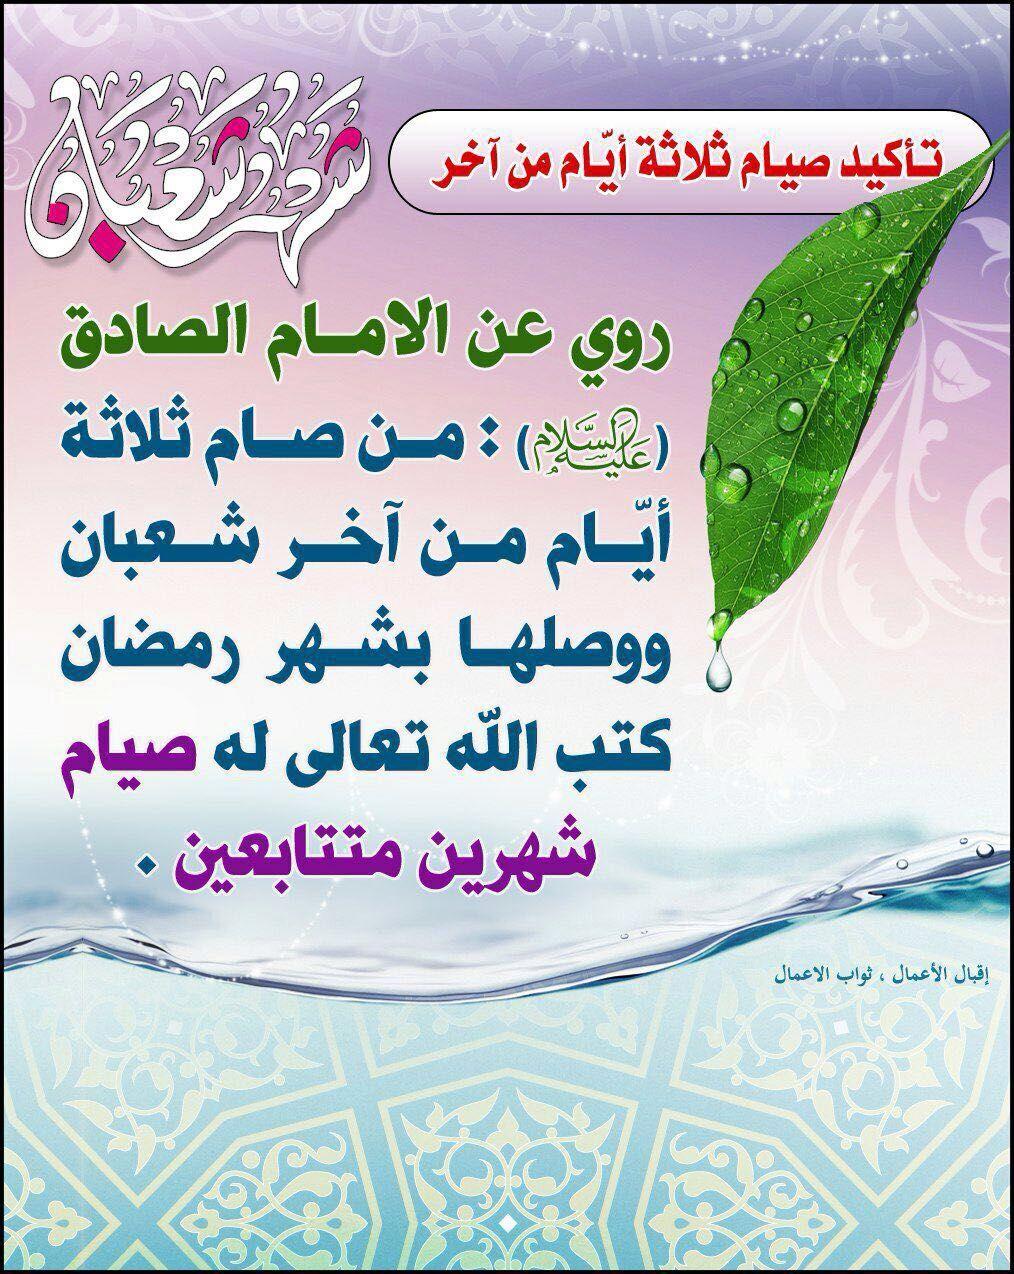 Pin By زهرة علي On قالوا٢ Calligraphy Arabic Calligraphy Arabic